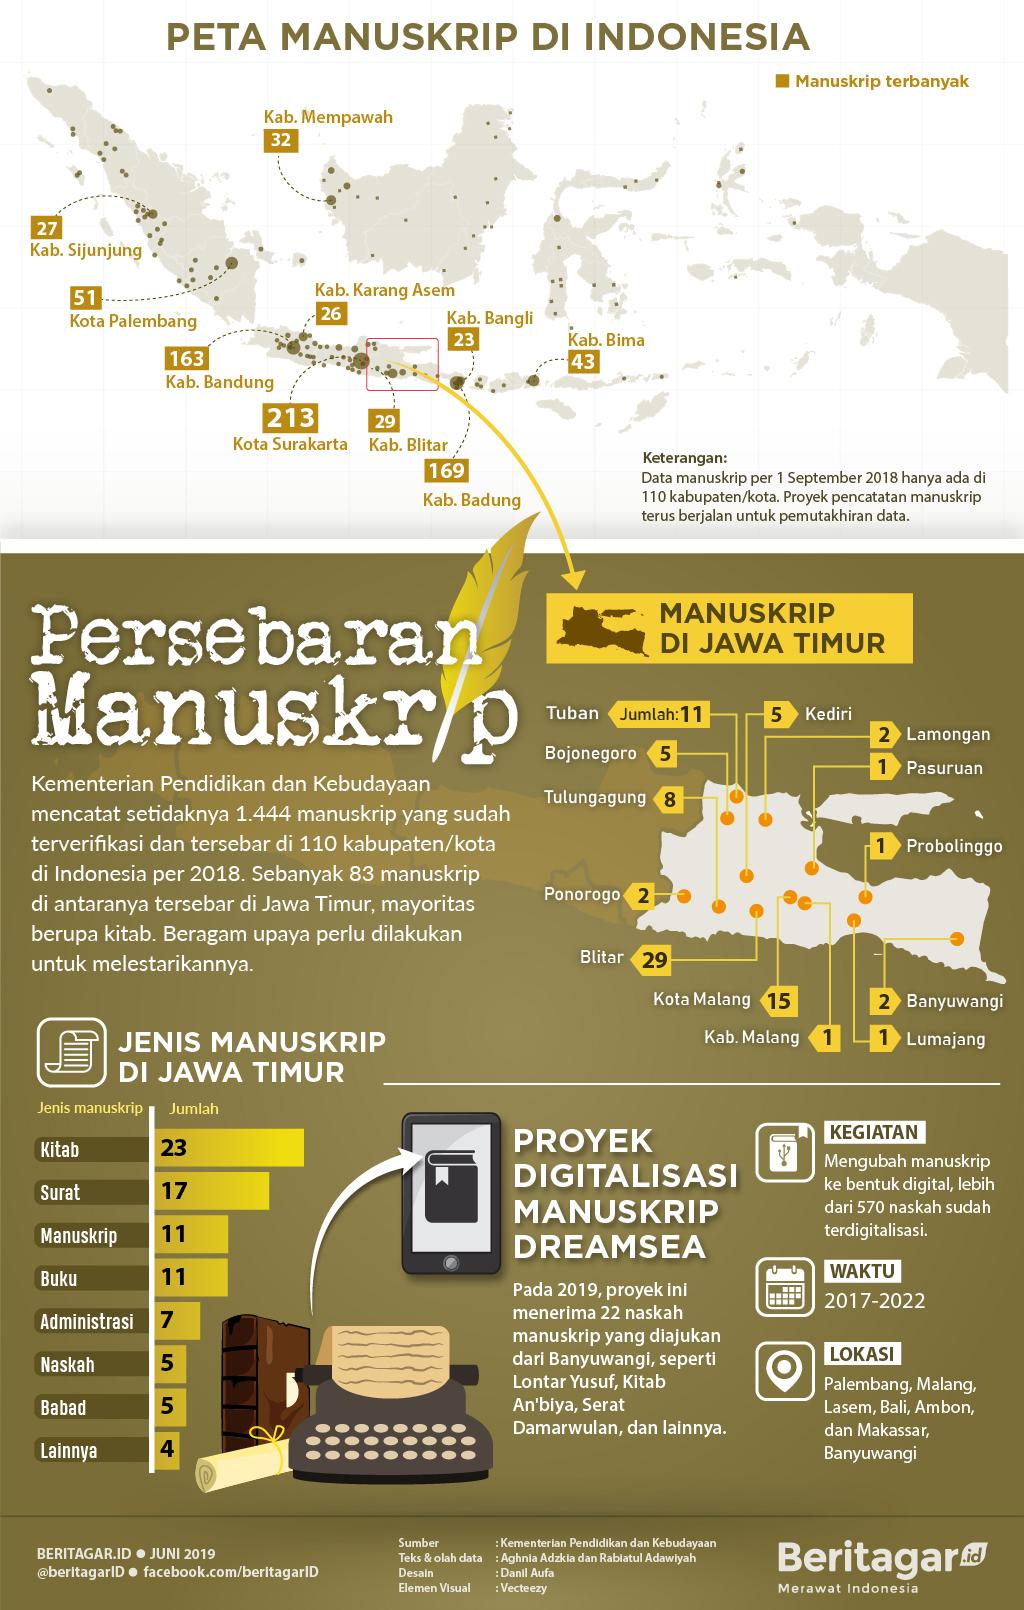 Infografis Persebaran Manuskrip di Jawa Timur